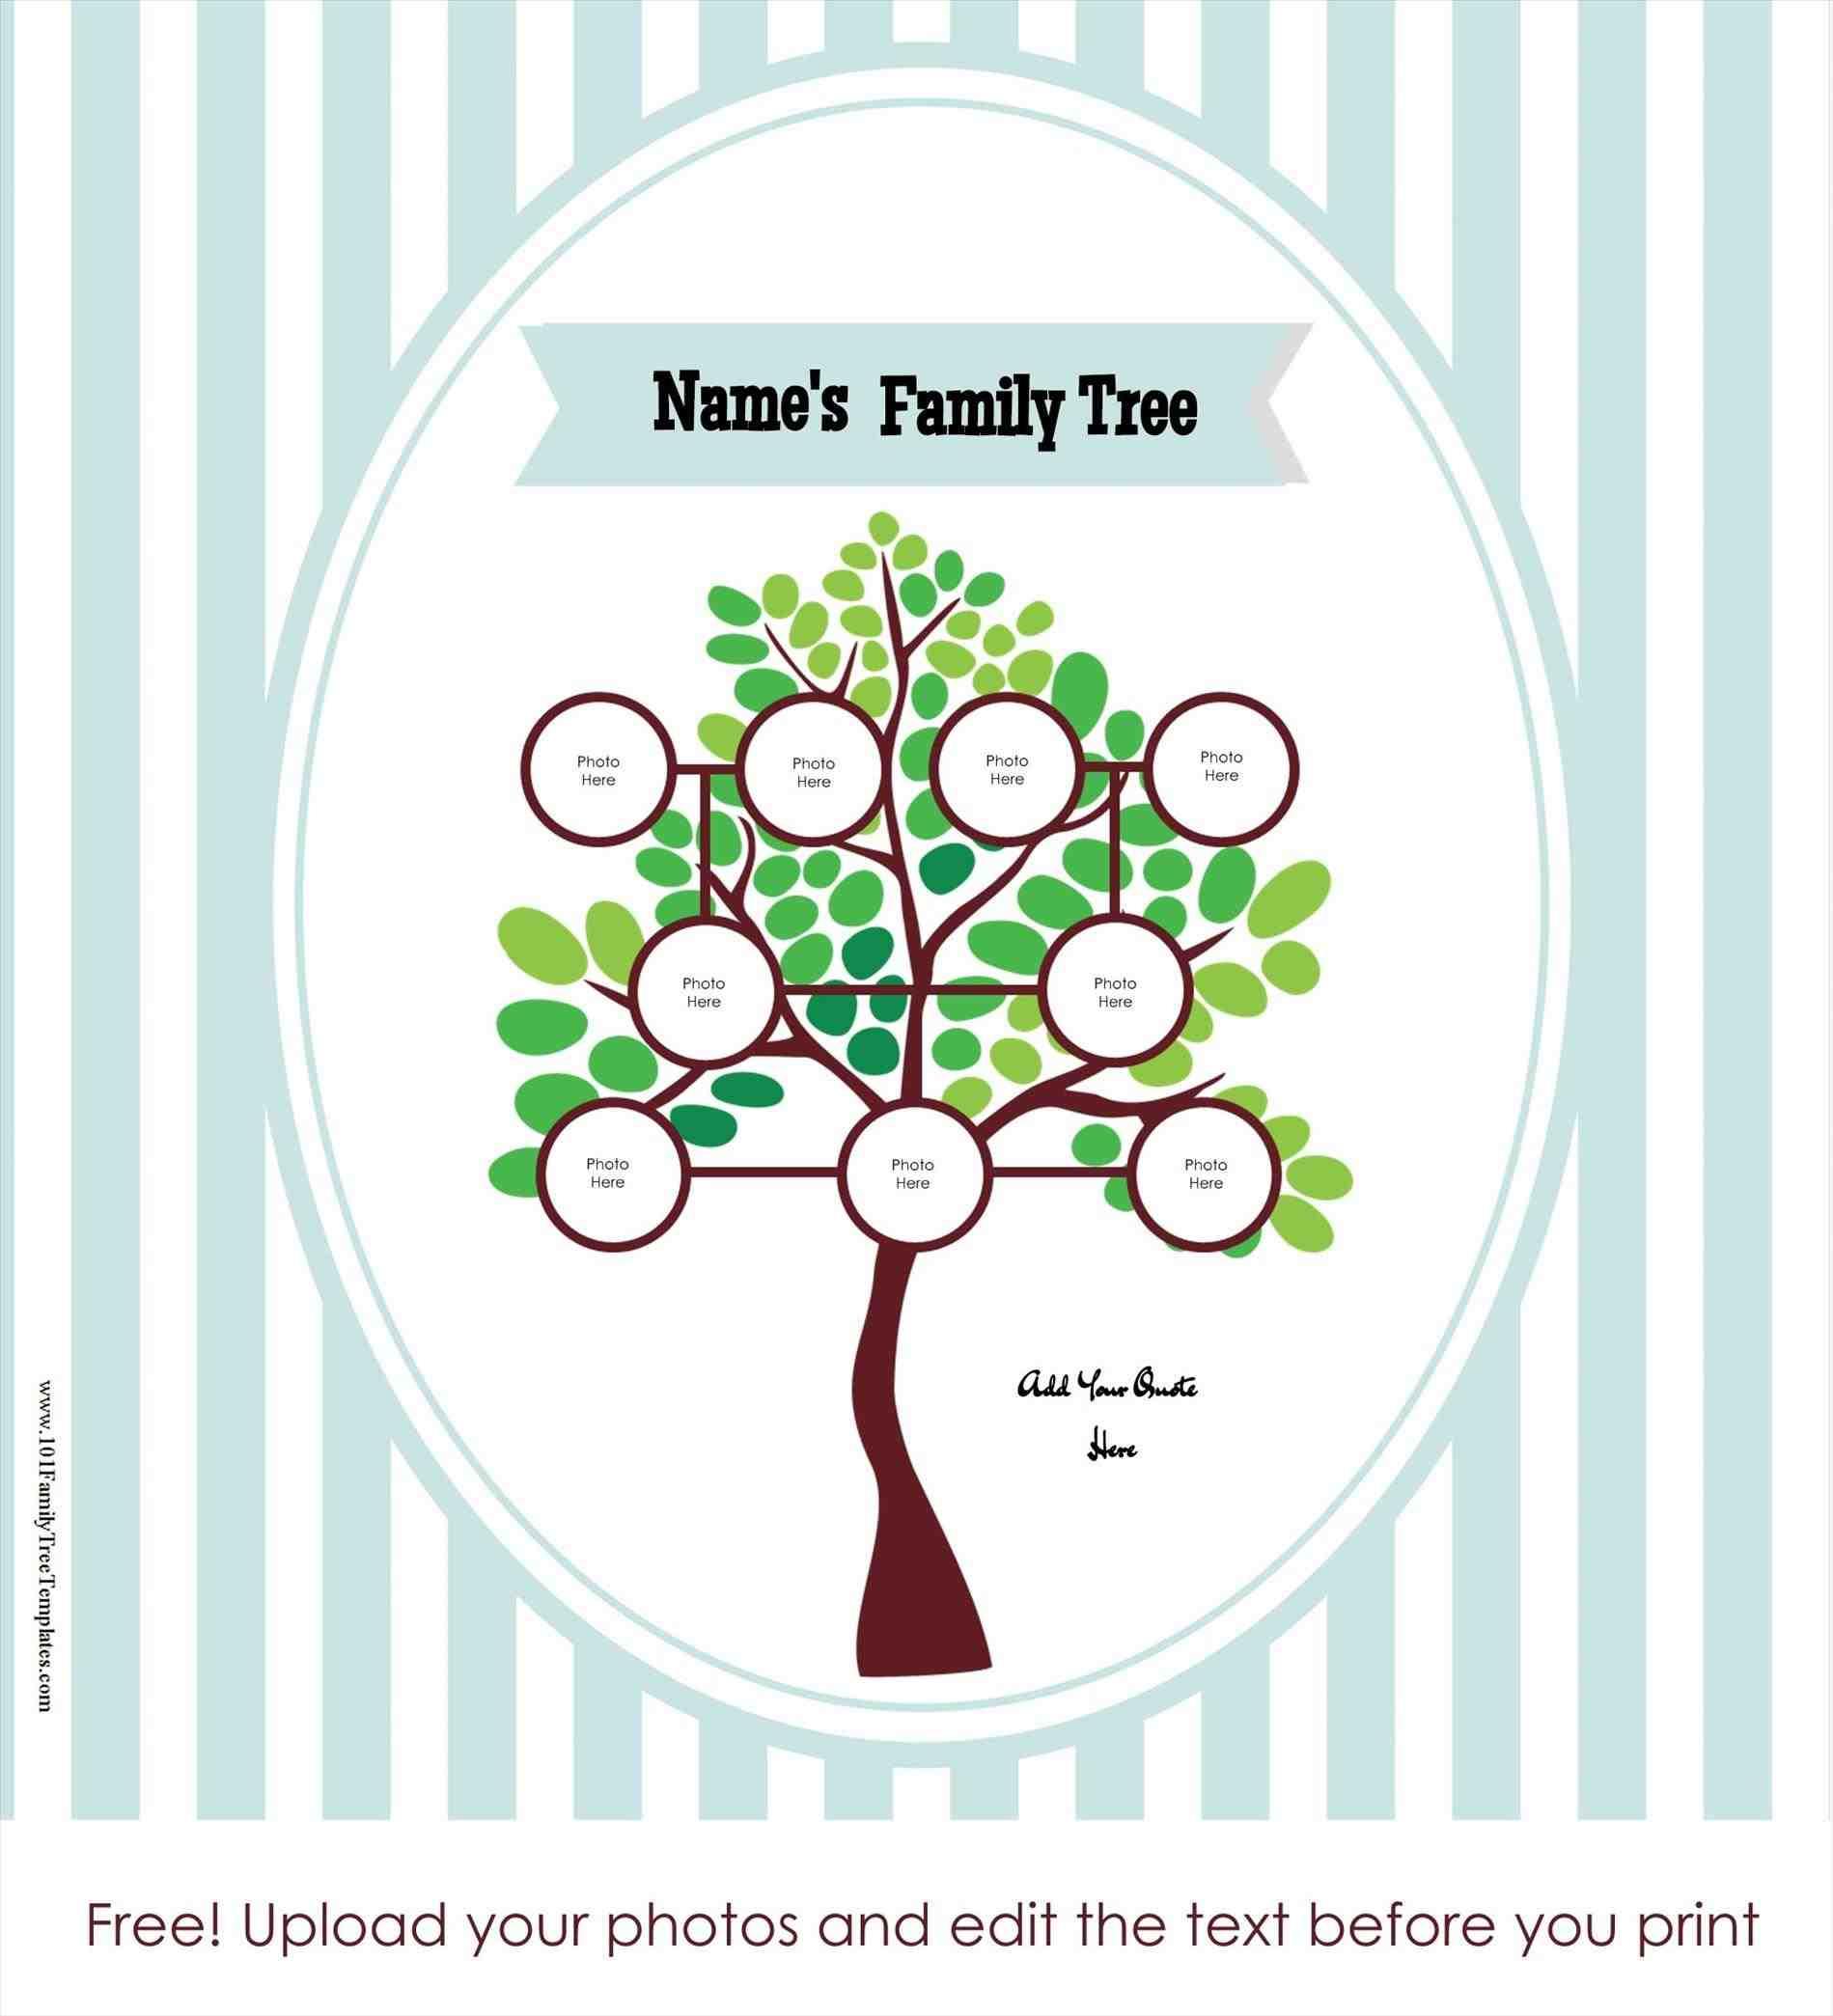 Free-Online-Family-Tree-Template-Tree-Maker-Templates - Family Tree Maker Free Printable